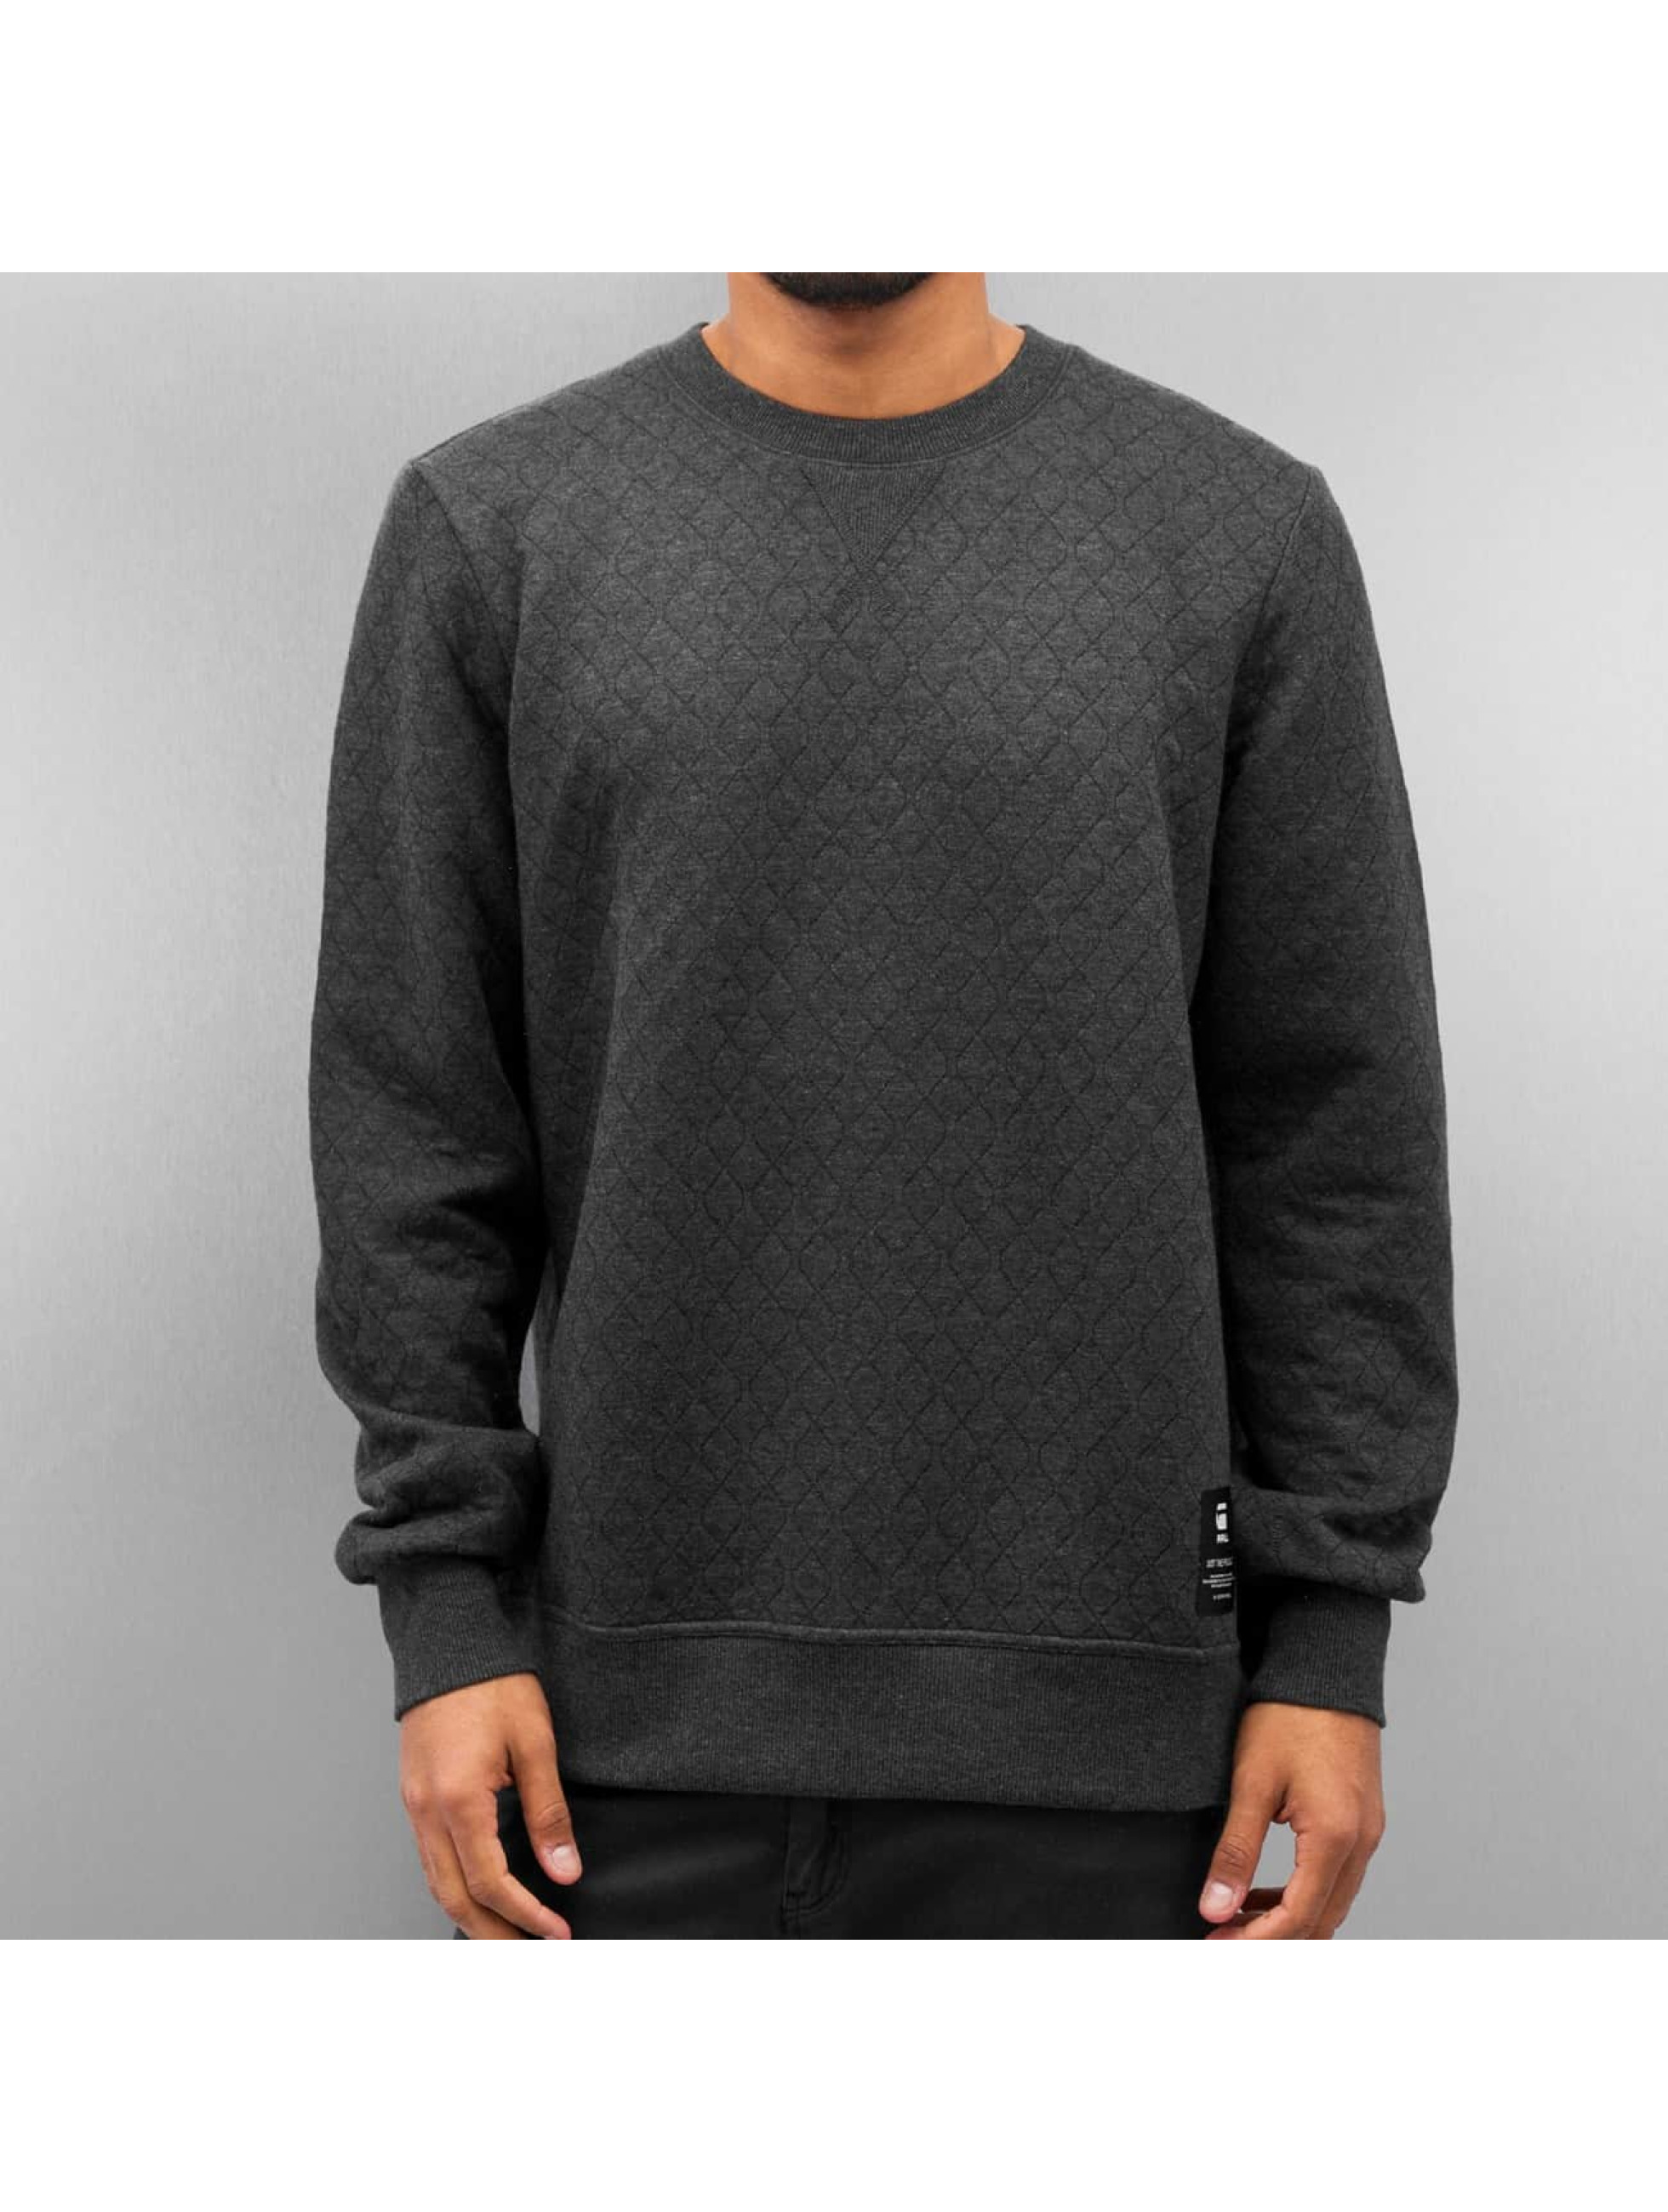 G-Star trui Heldrex Utah Jacquard zwart